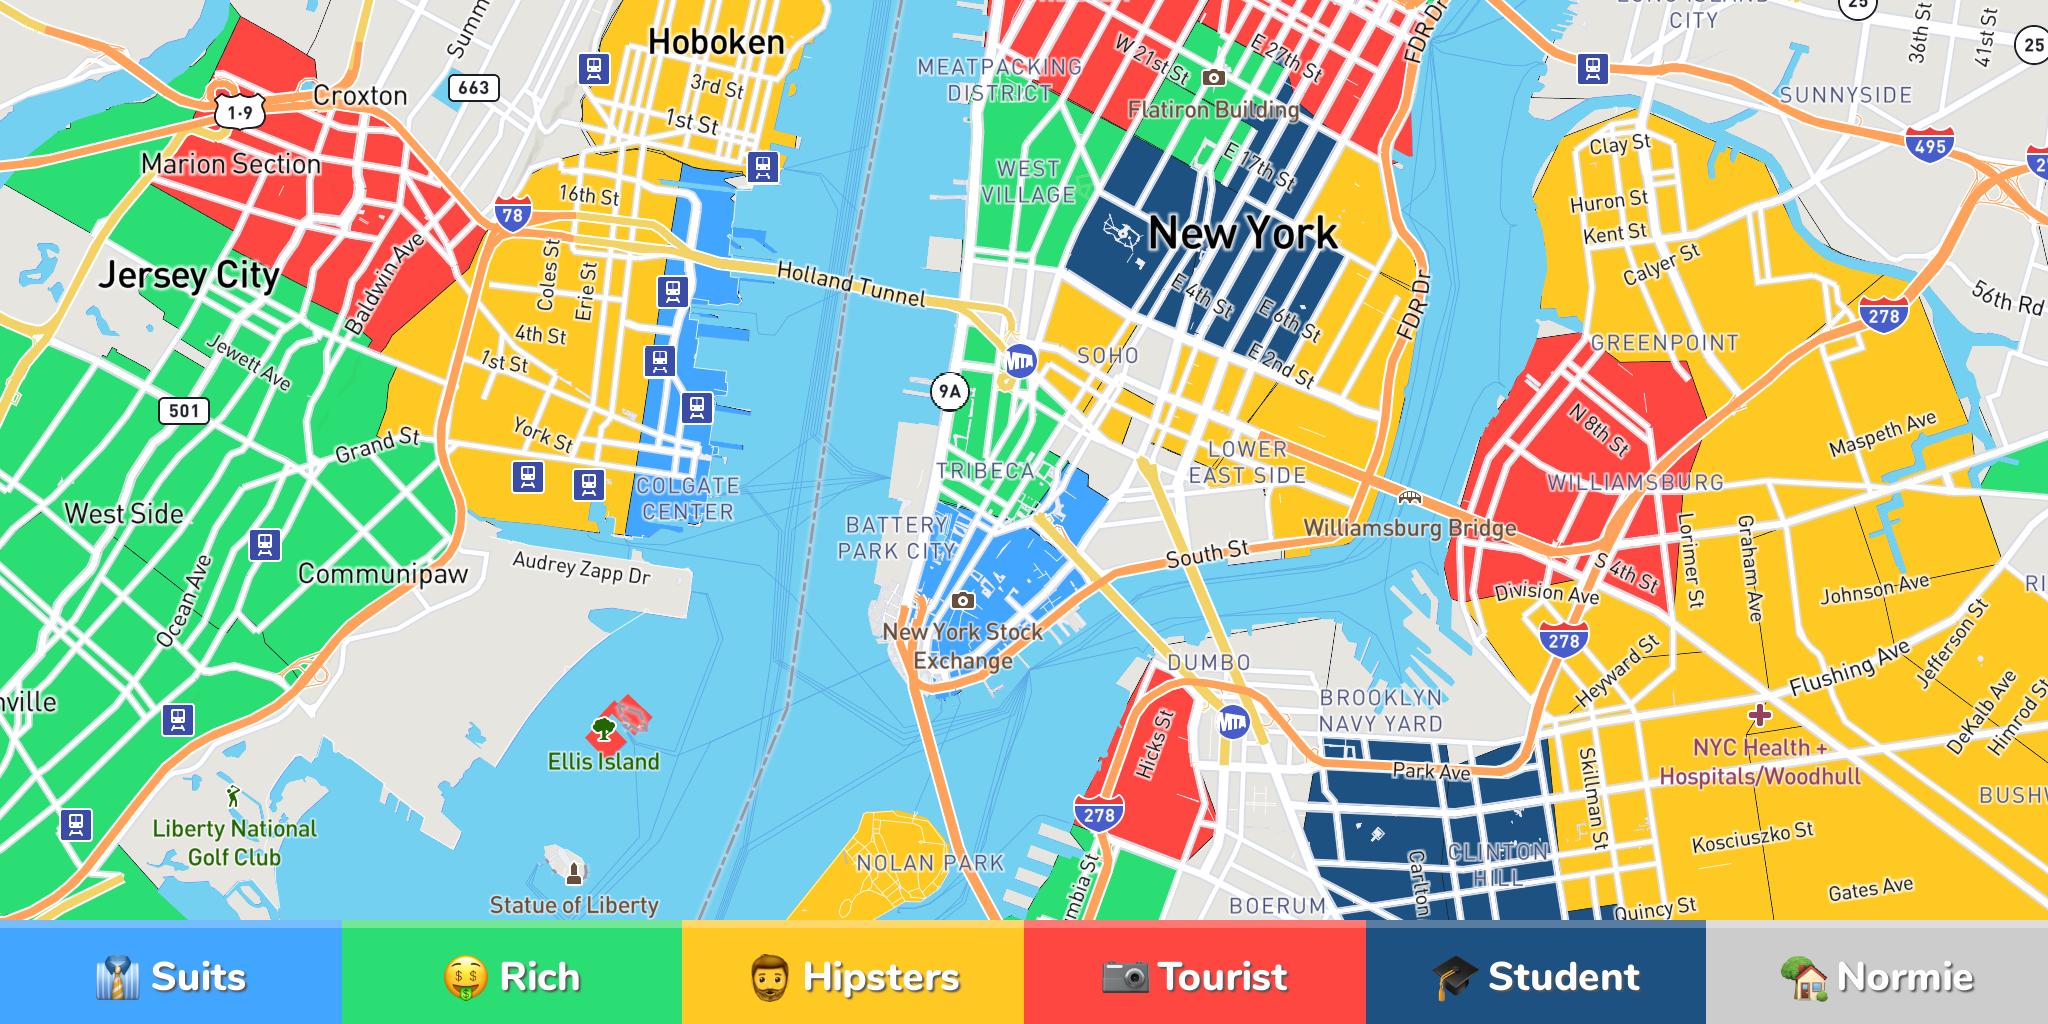 Where To Stay Around The World Neighborhood Maps By Hoodmaps